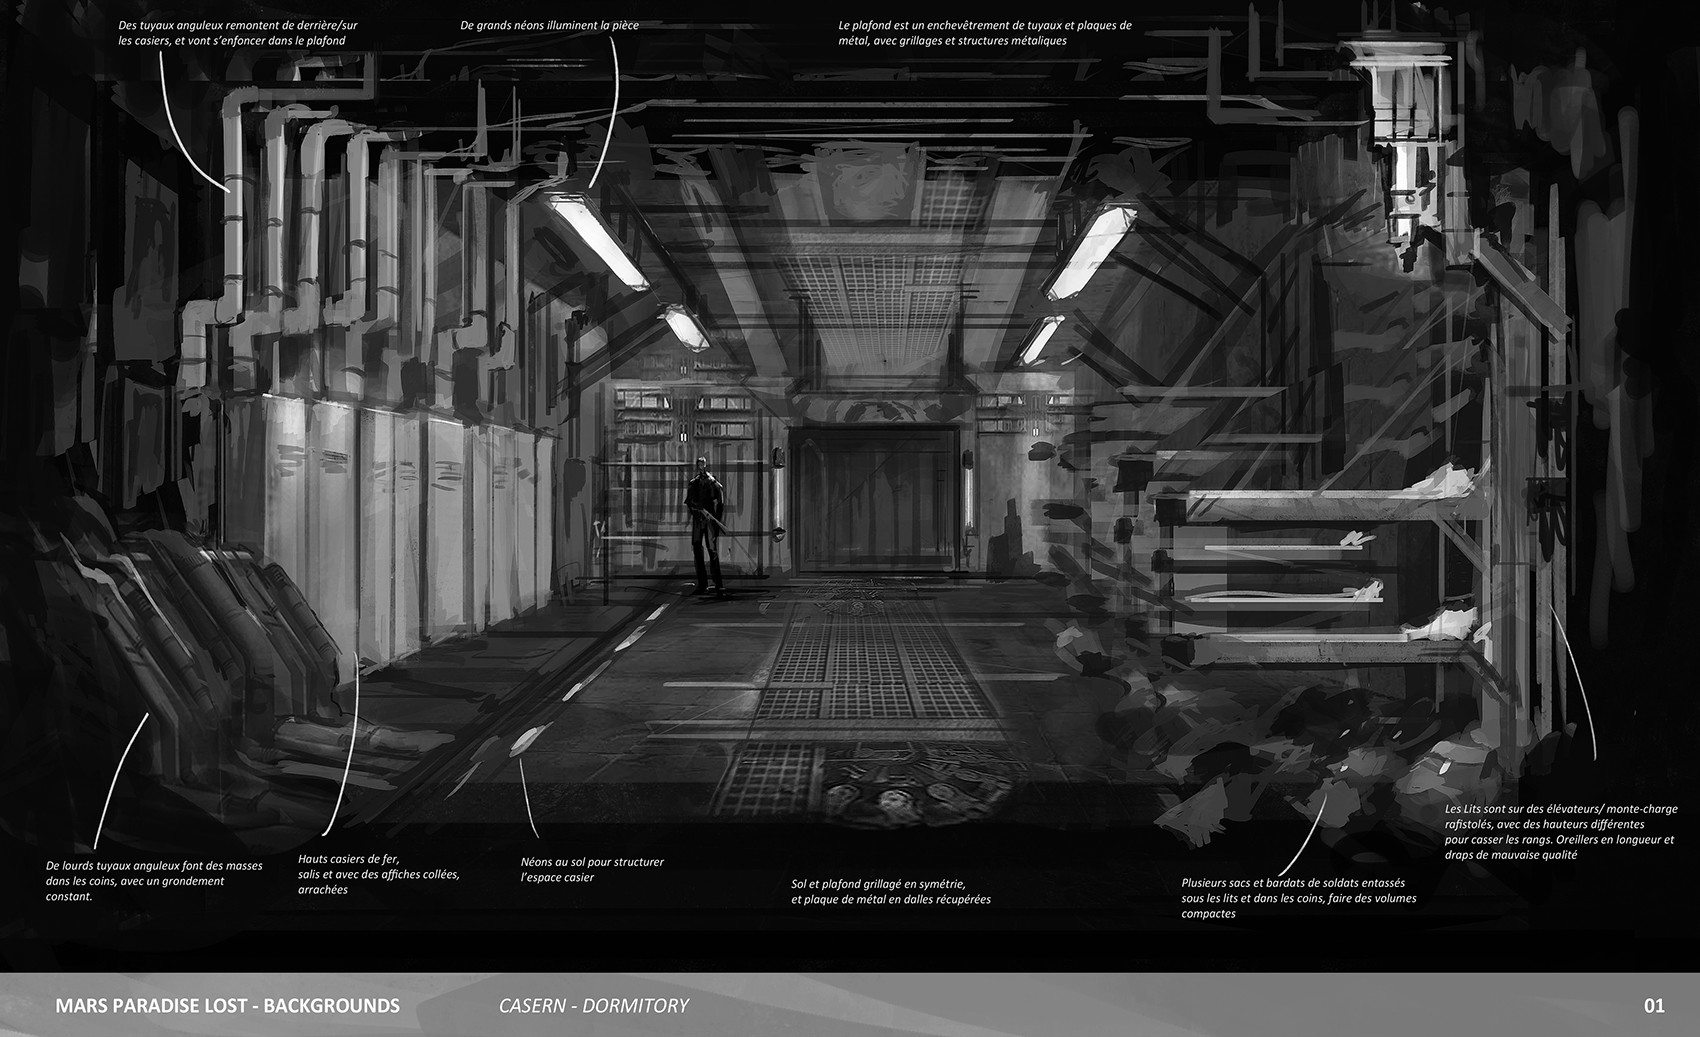 Alexandre chaudret mpl backgrounds ophir caserne01